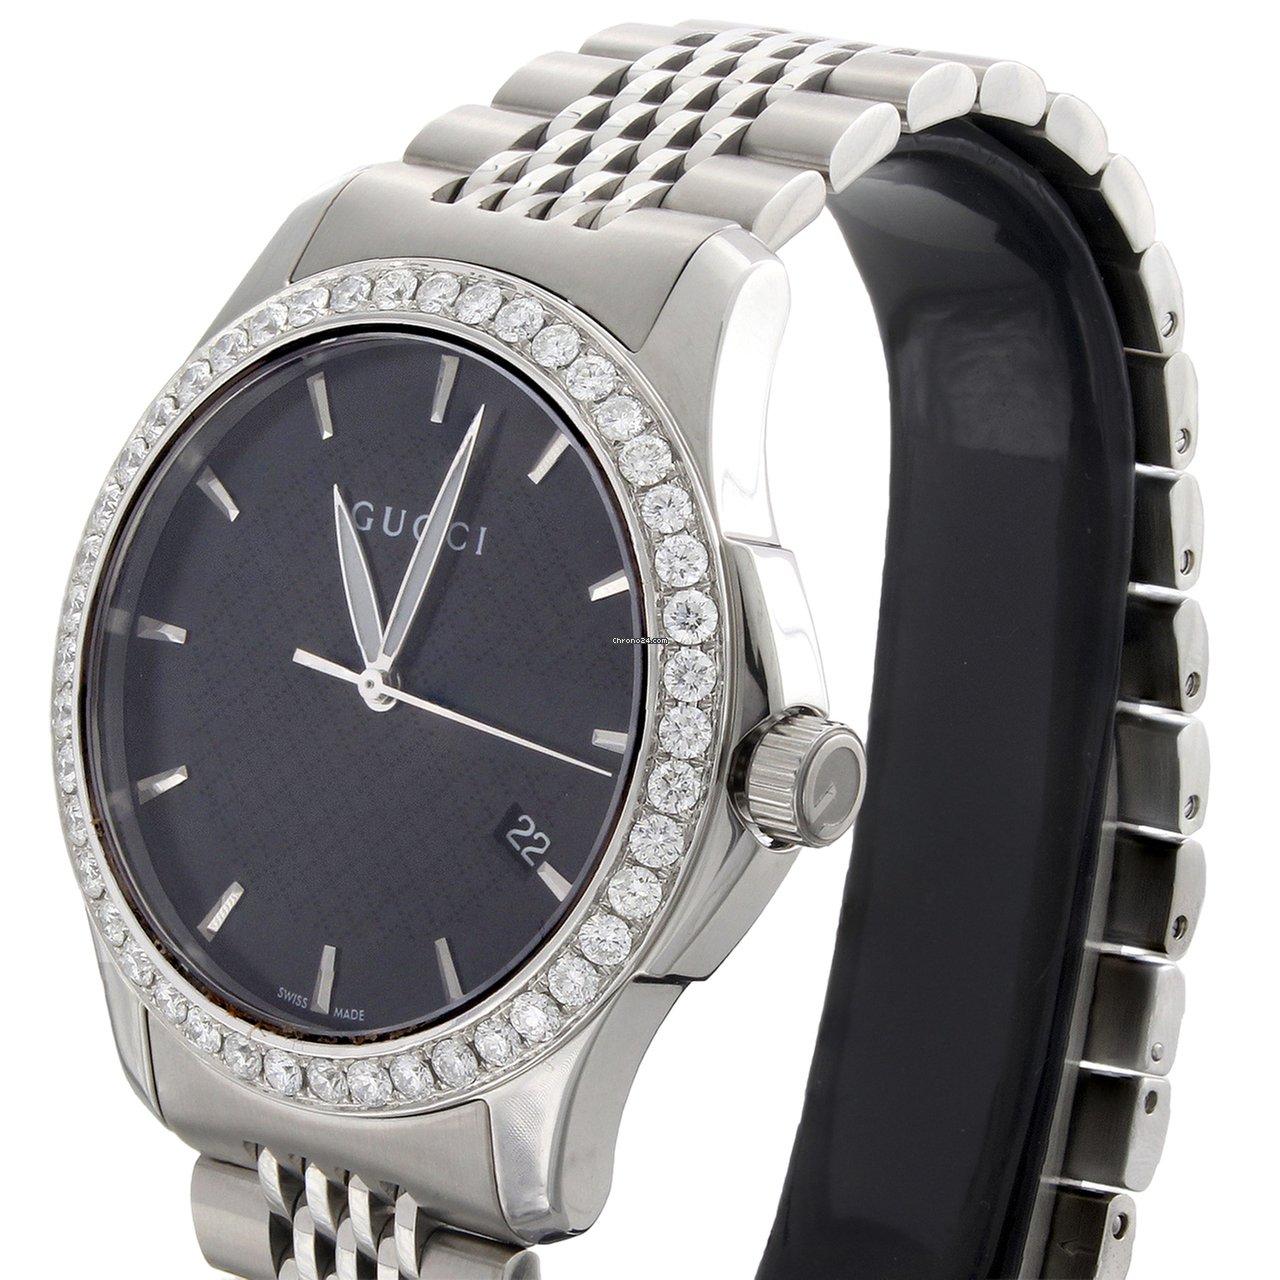 032181f3c1c Gucci Ya126402 Diamond Watch Black Dial G-Timeless 38mm... for ...